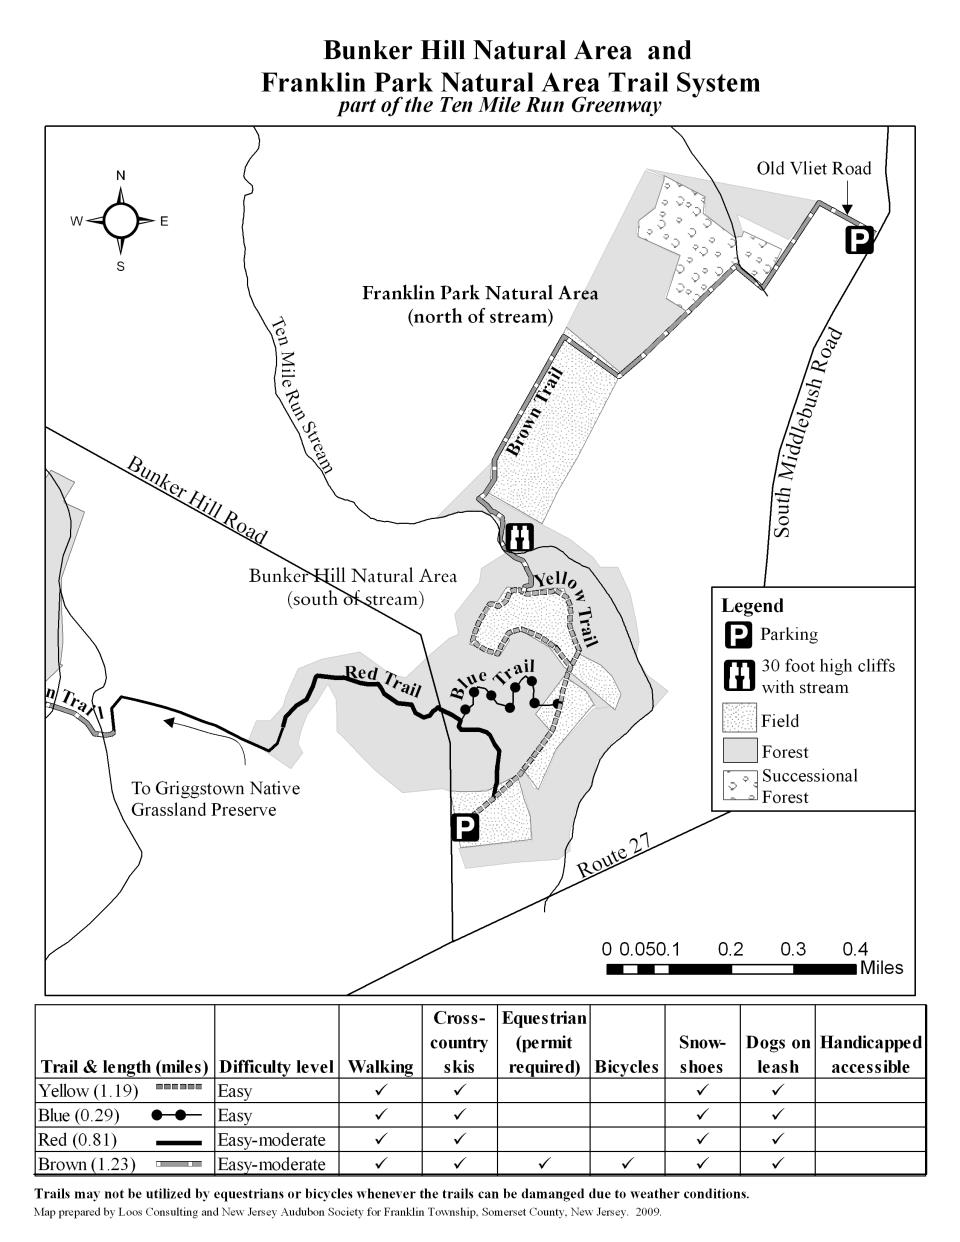 Bunker_Hill_map